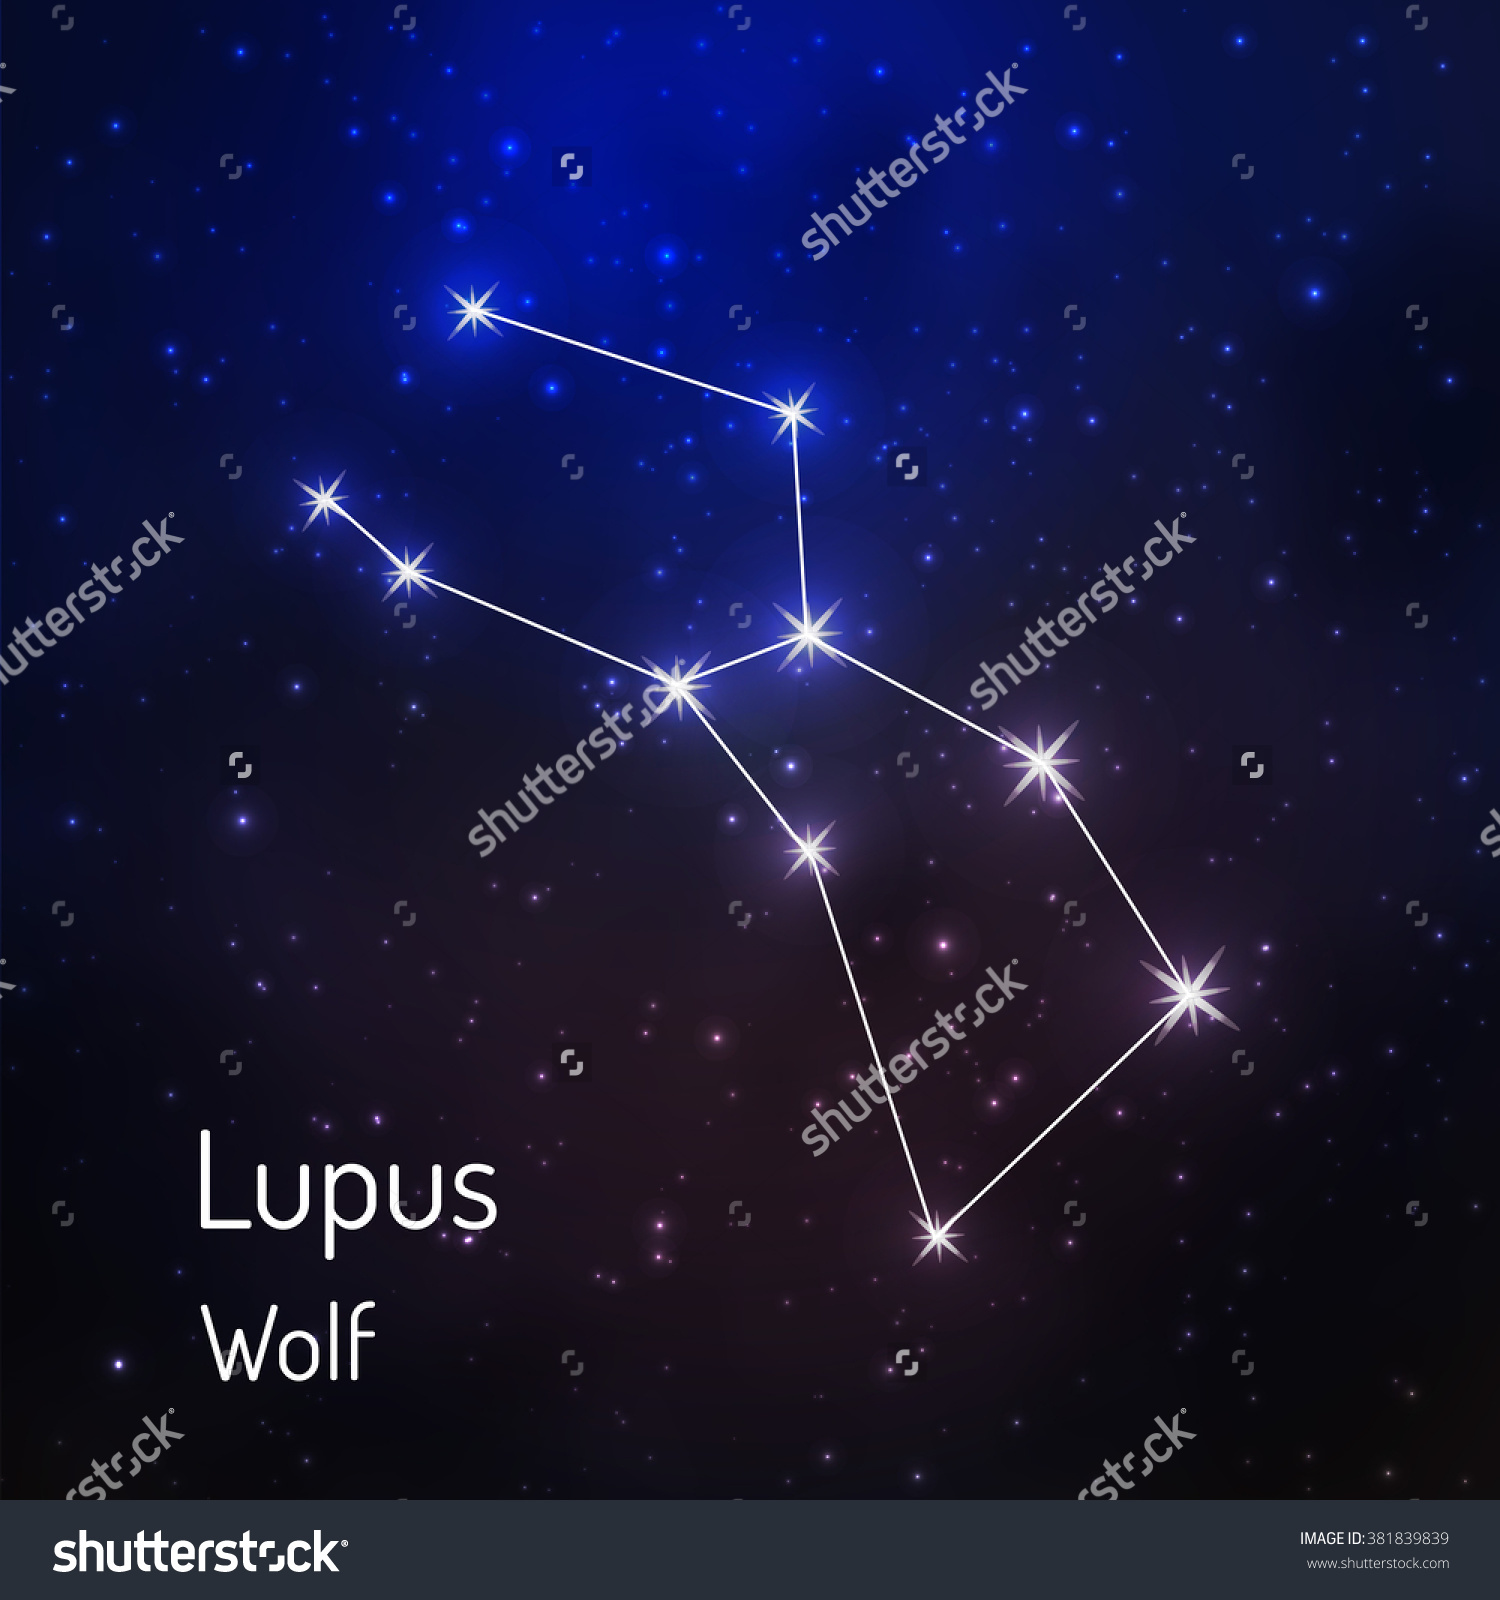 Lupus Wolf Constellation Night Starry Sky Stock Vector 381839839.